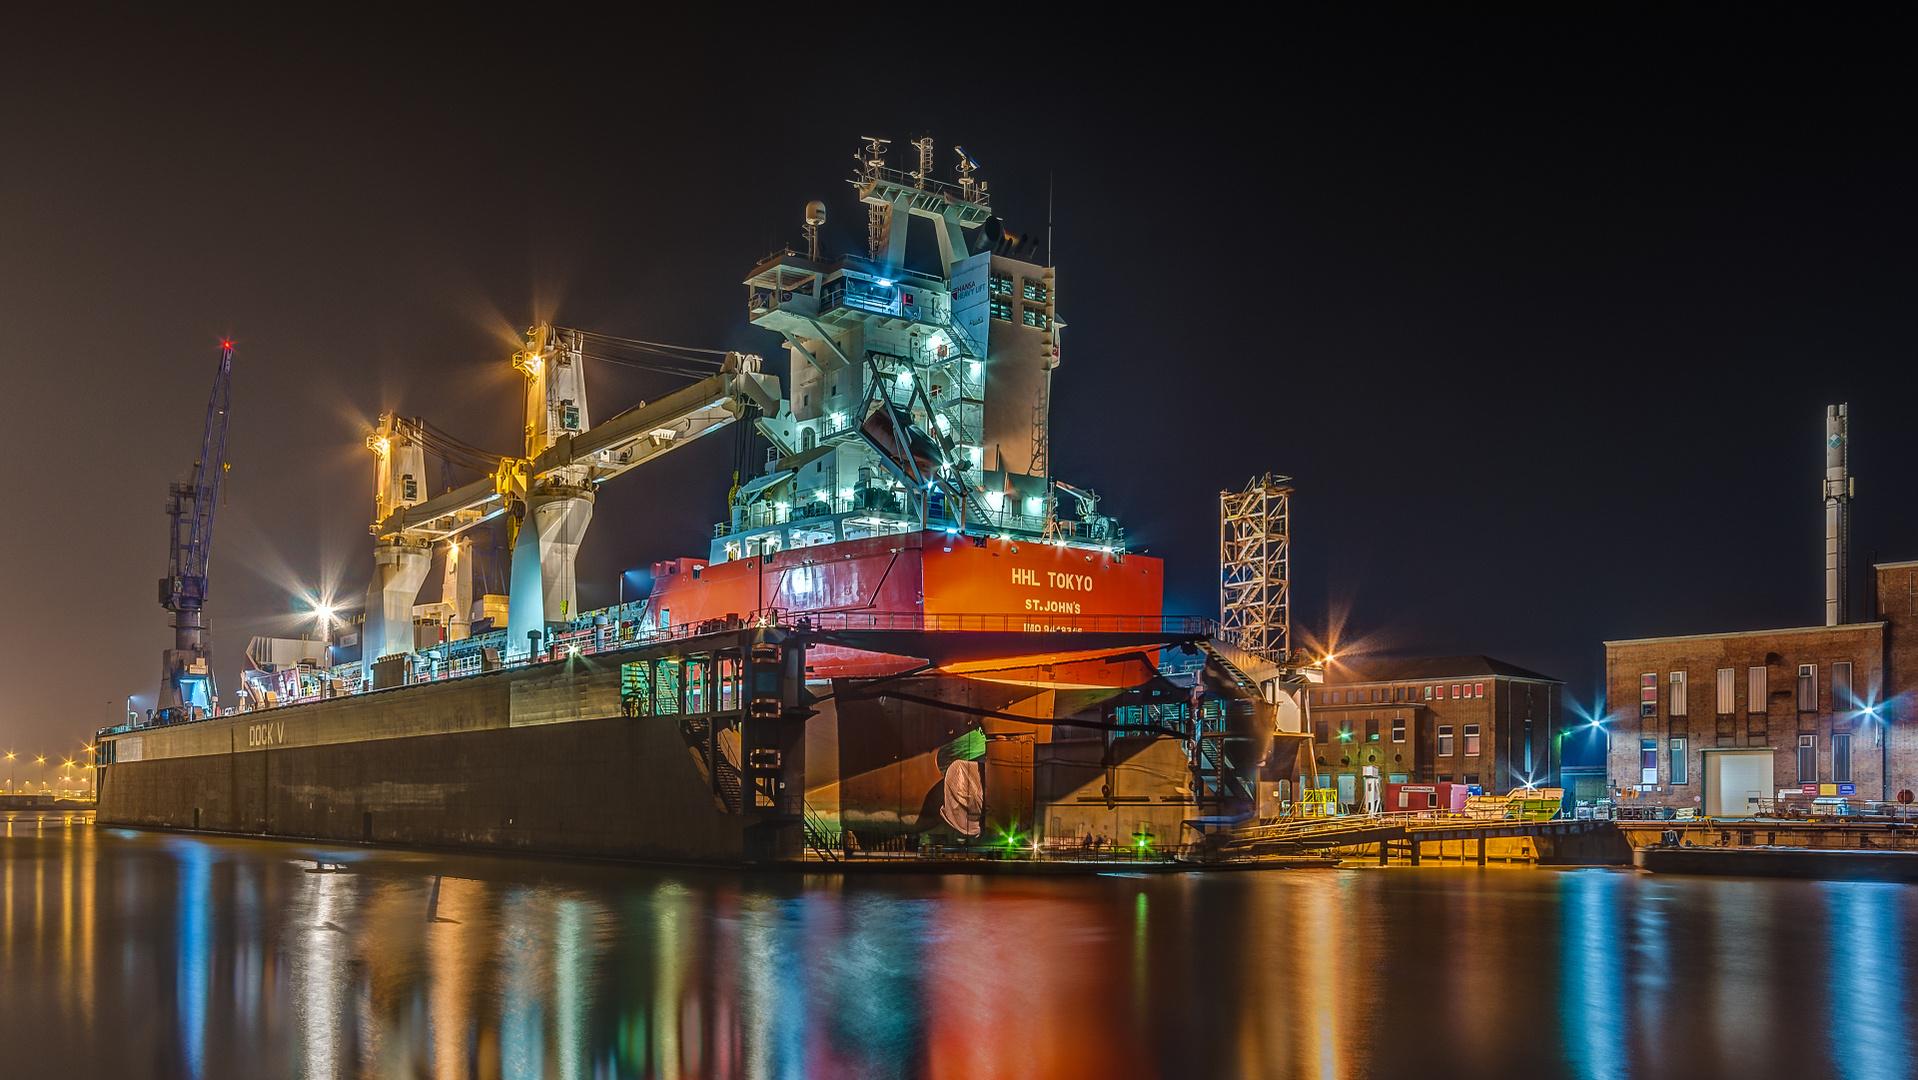 HHL TOKYO wird in Dock V repariert